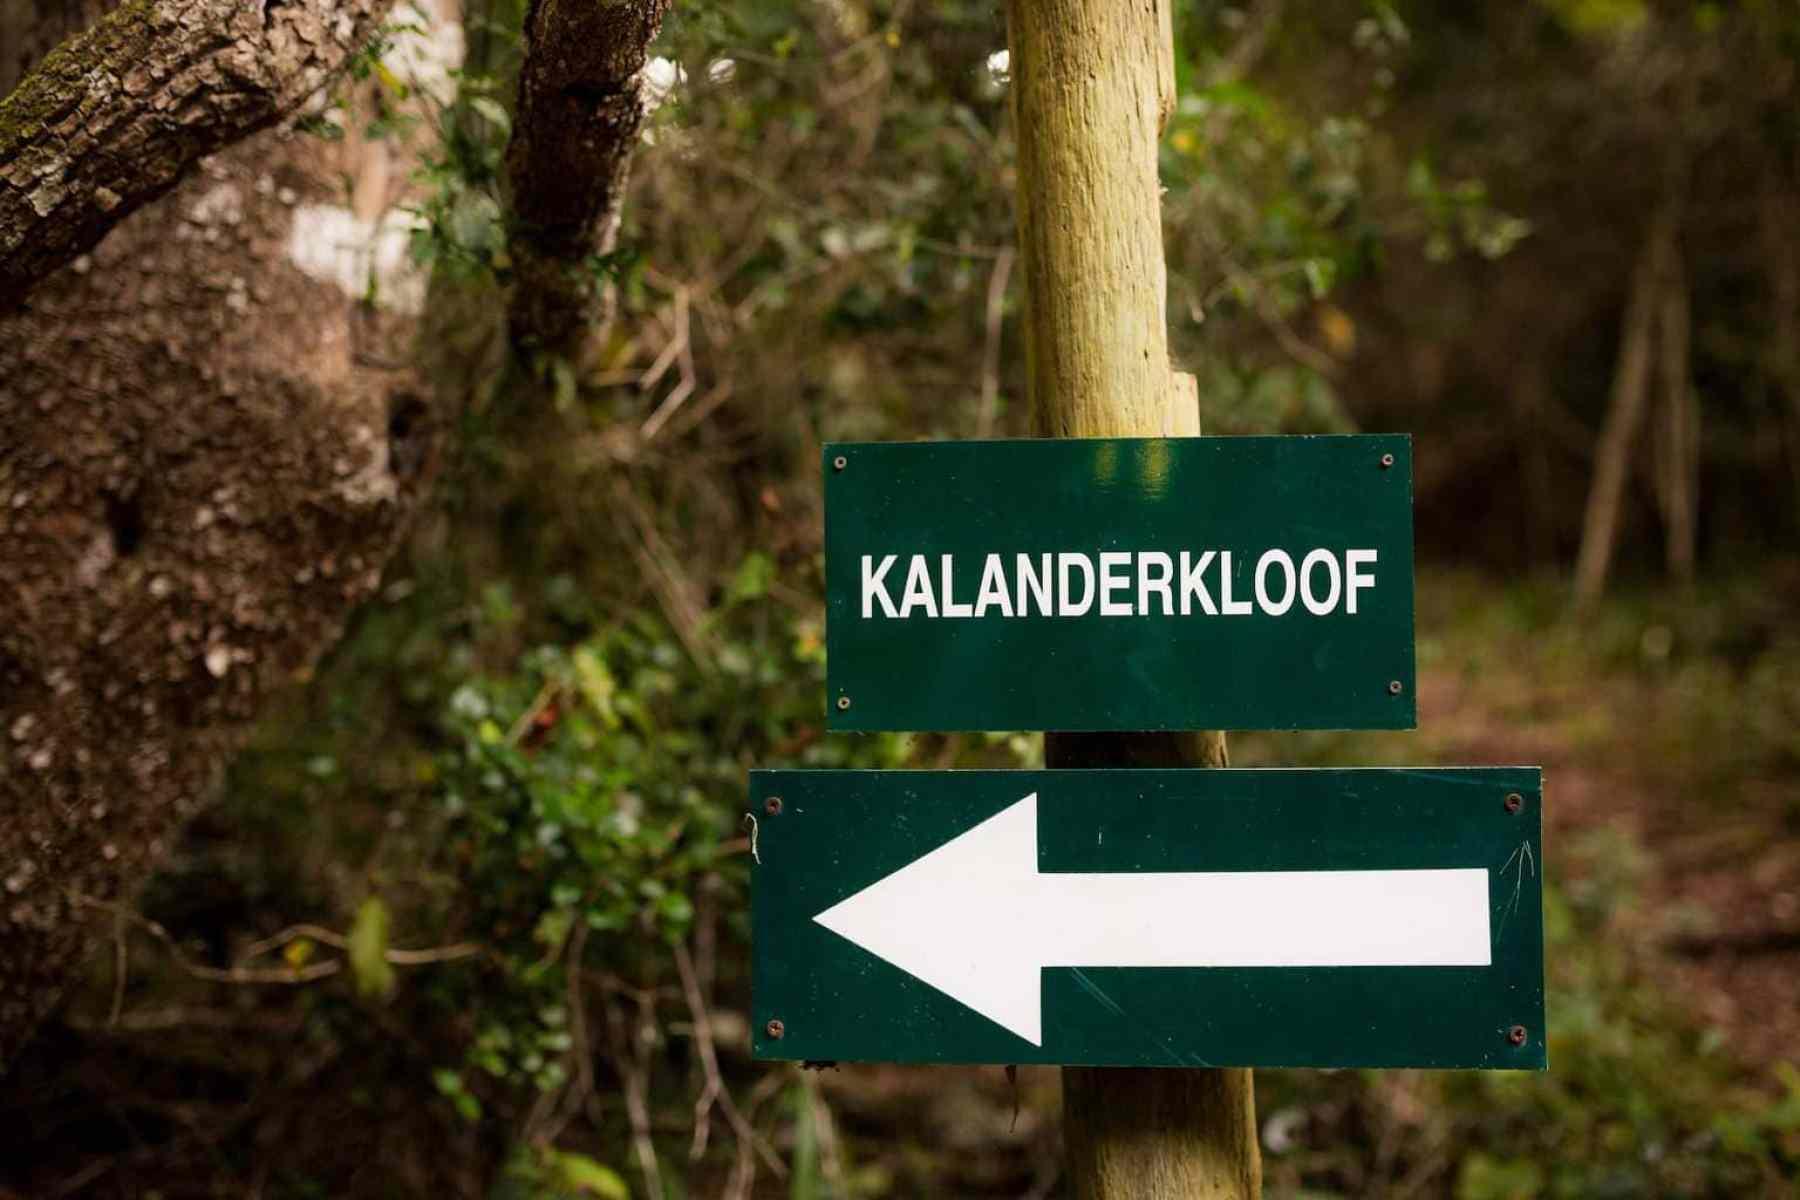 Kalanderkloof trail